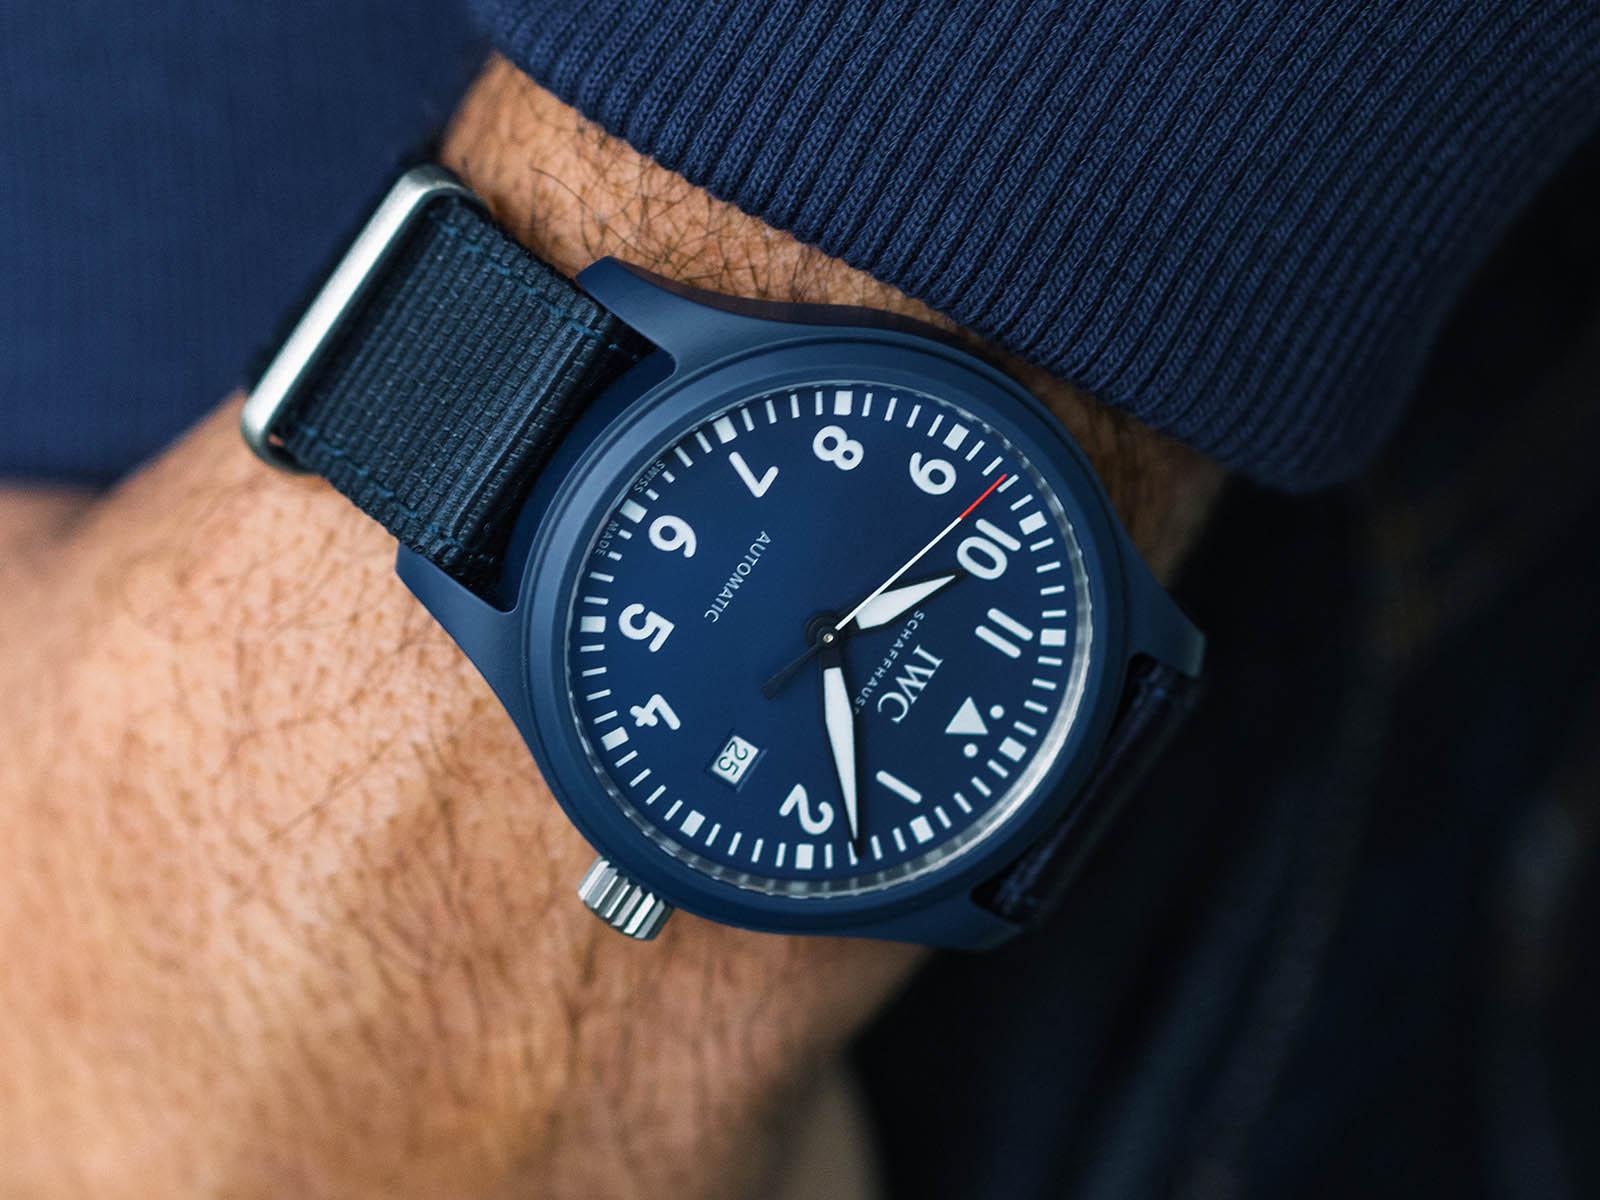 iw328101-iwc-pilot-s-watch-automatic-edition-laureus-sport-for-good-4.jpg